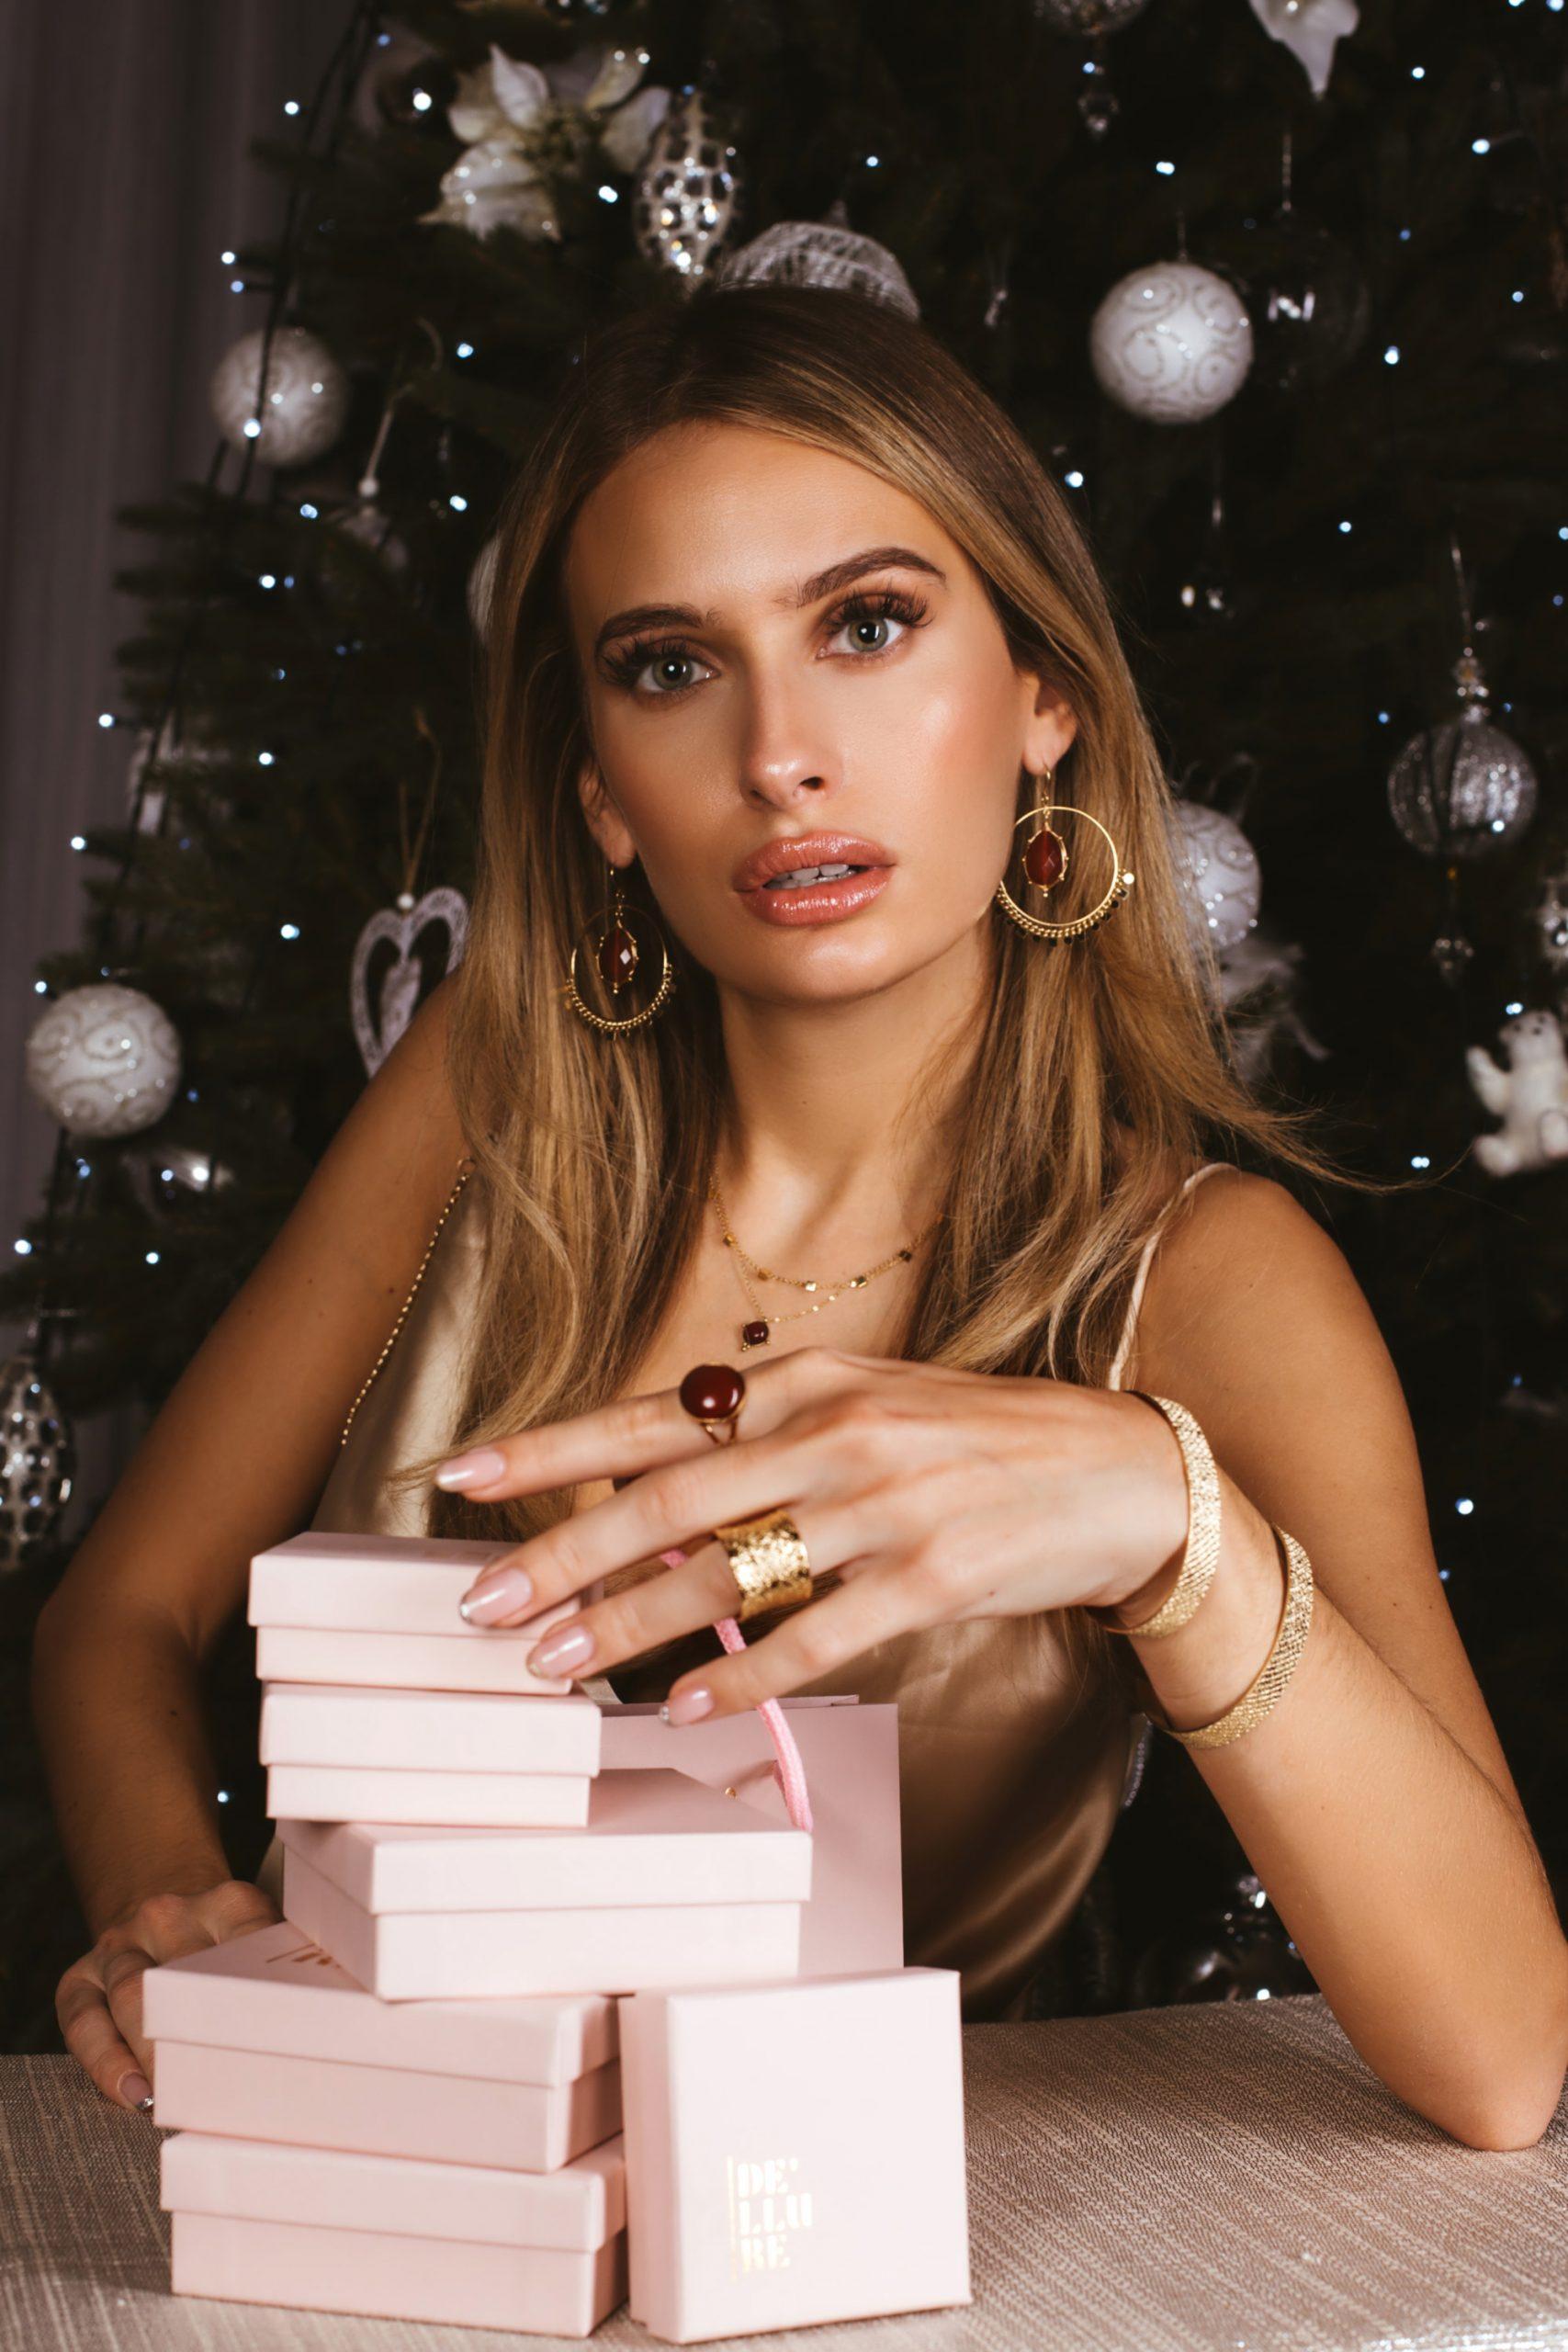 Najljepša blagdanska kolekcija dolazi nam iz De'llure!